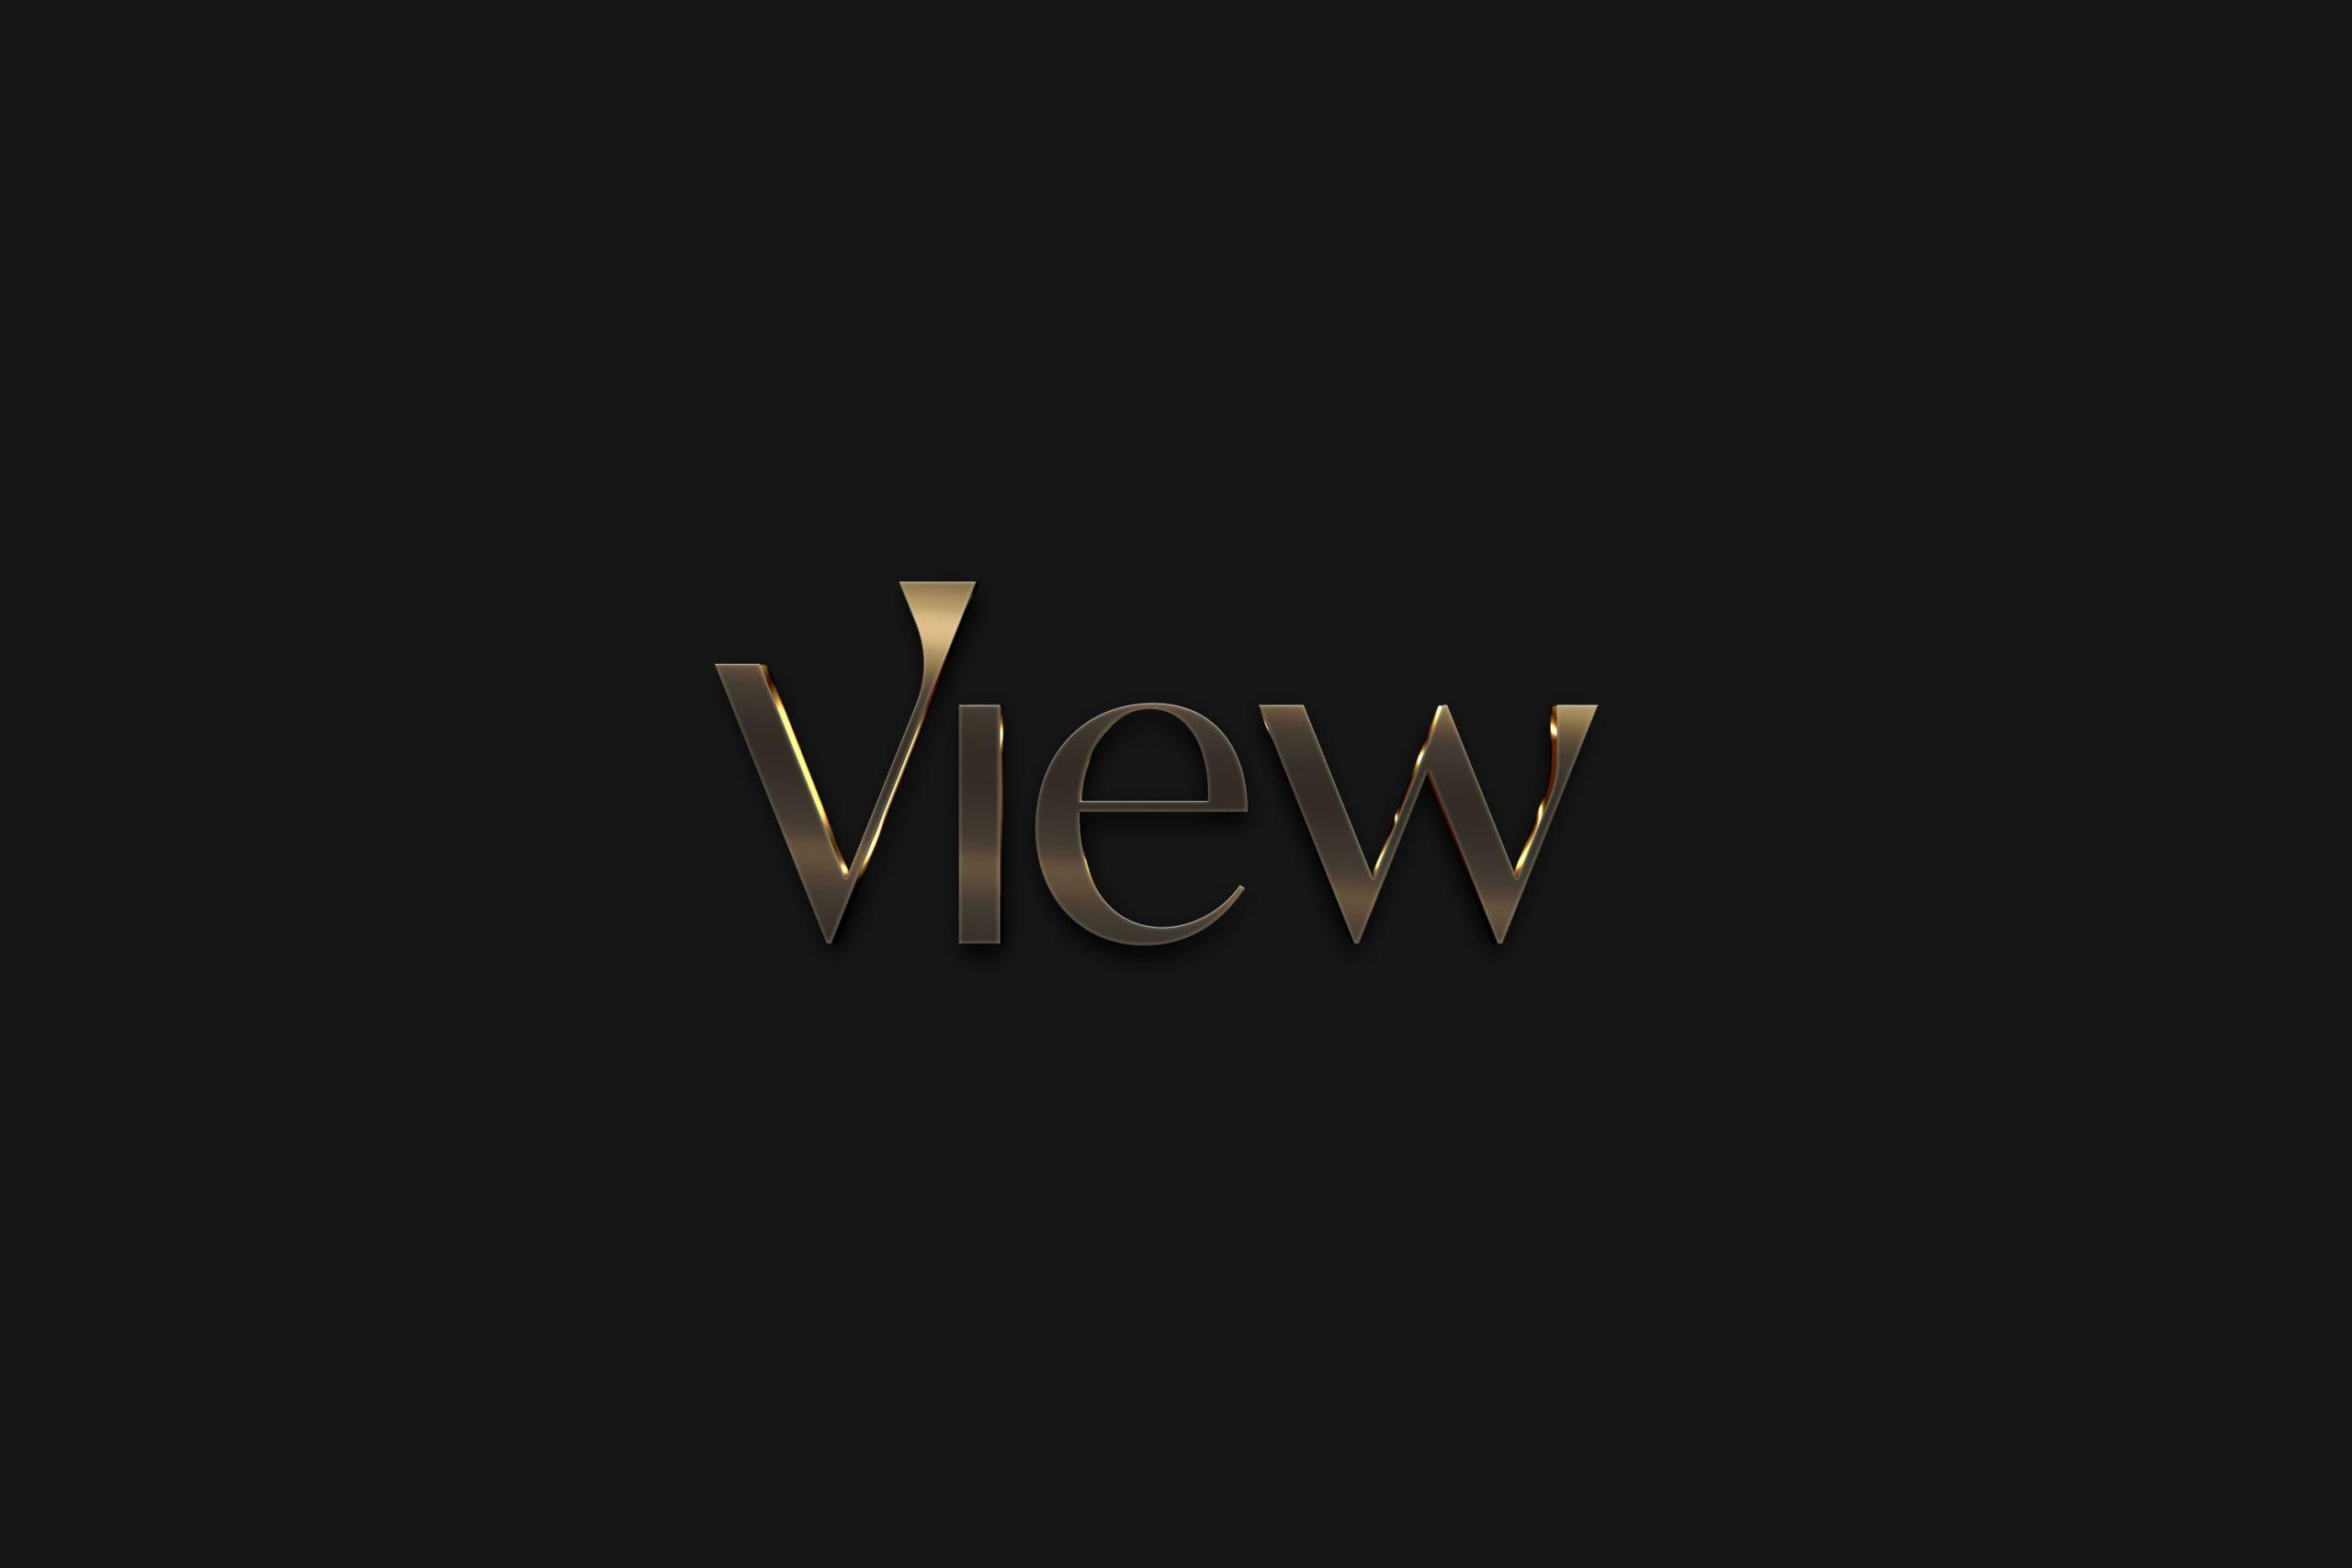 View-3DLogo-Work-by-YaStudio-20